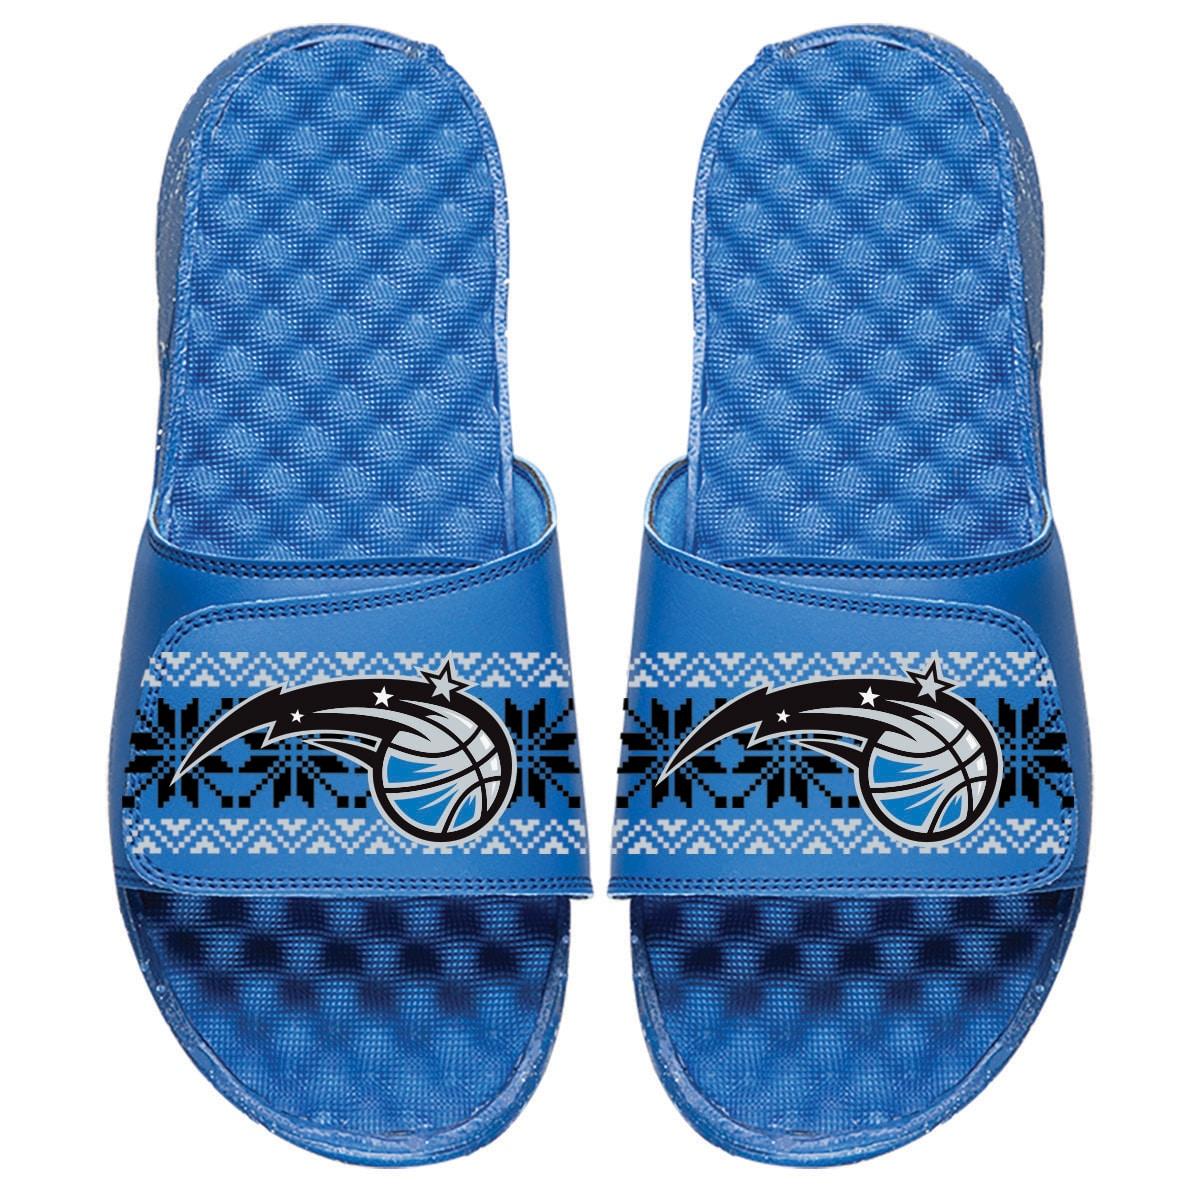 Orlando Magic ISlide Youth Ugly Sweater Slide Sandals - Royal